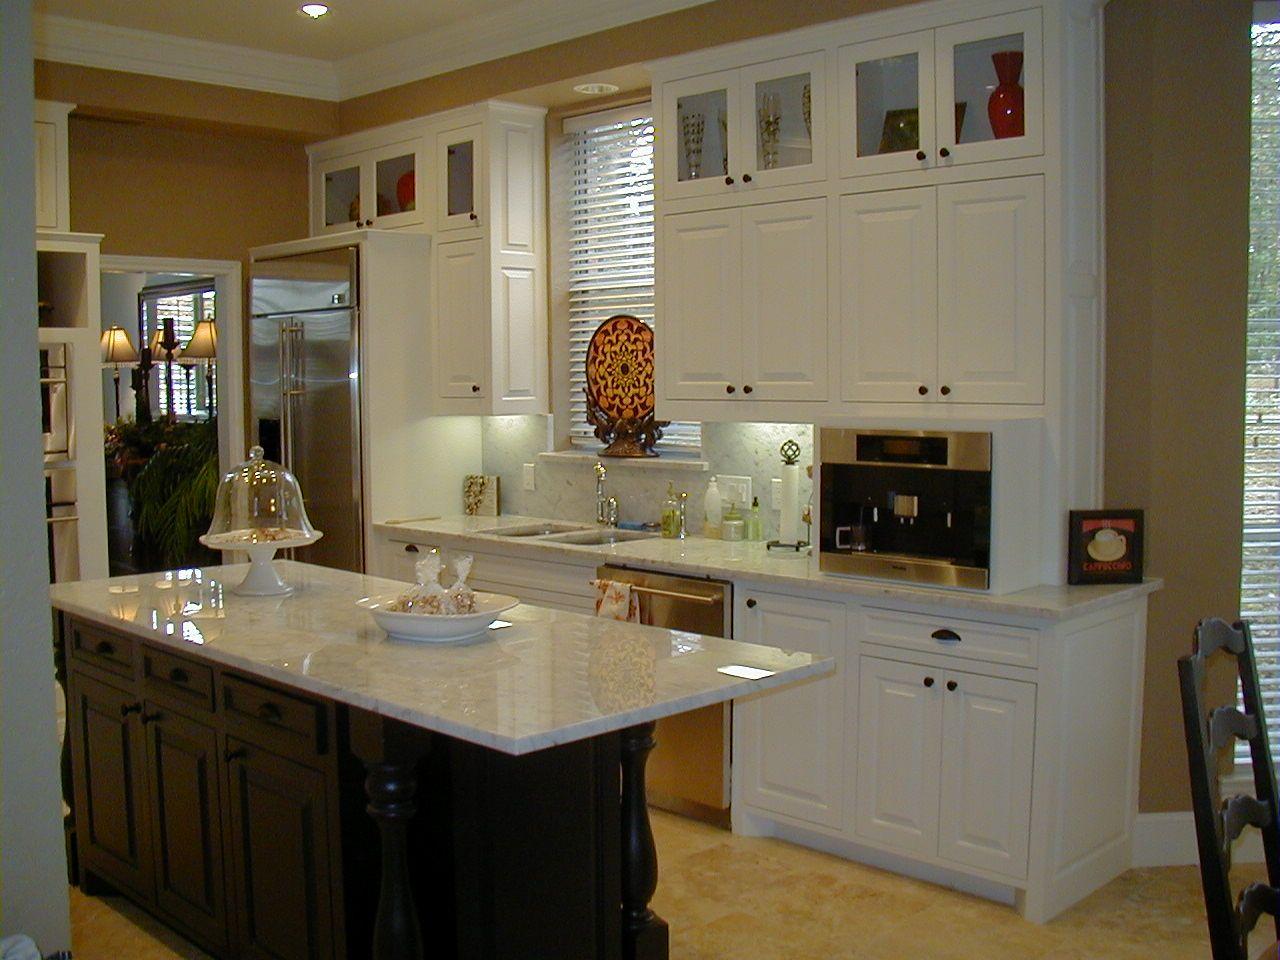 Making Kitchen Island Cabinets  Httpangelartauctionwp Brilliant Kitchen Island Cabinet Design Review